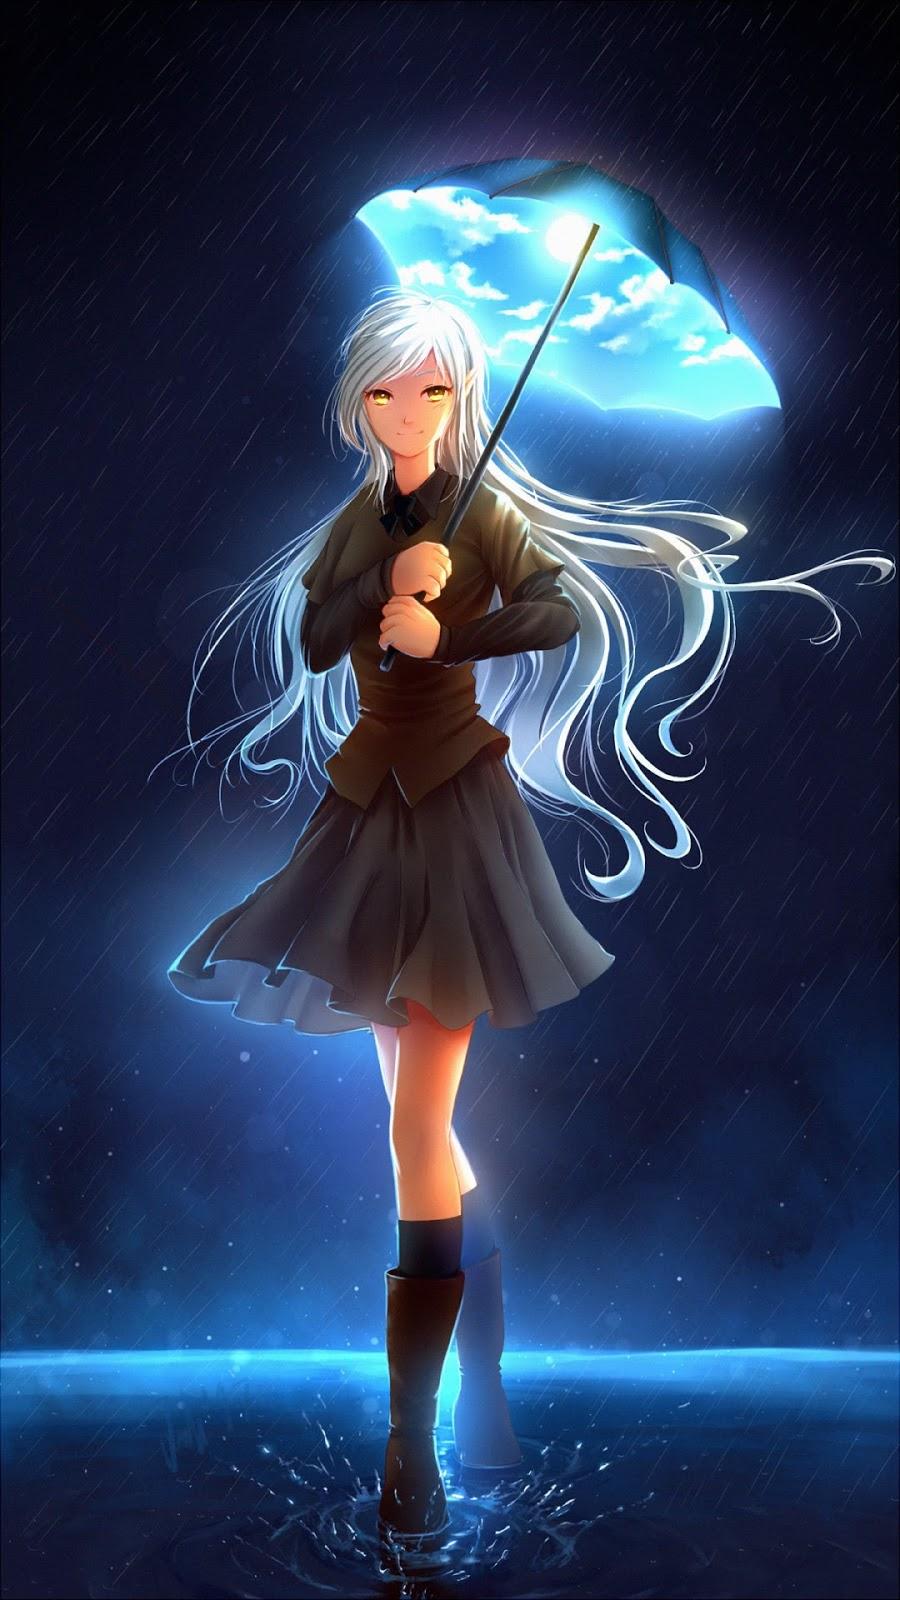 Anime girl with magical umbrella mobile wallpaper